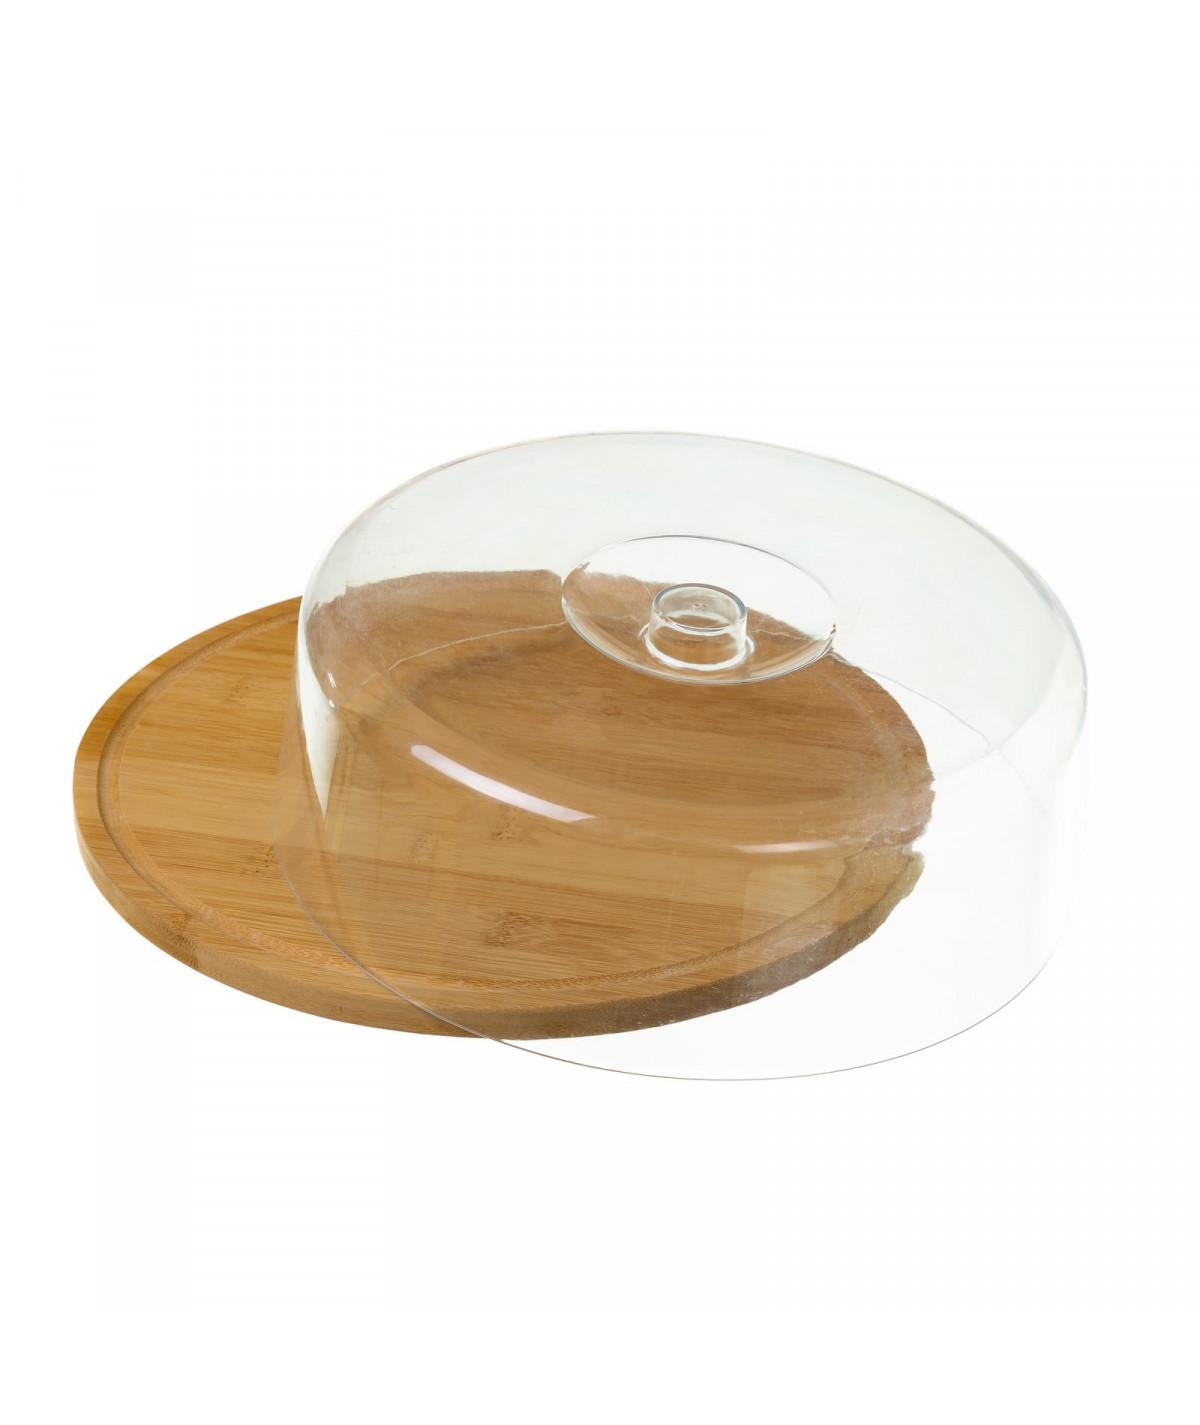 Plateau à fromage en bambou avec cloche - Plat en bambou | Yesdeko